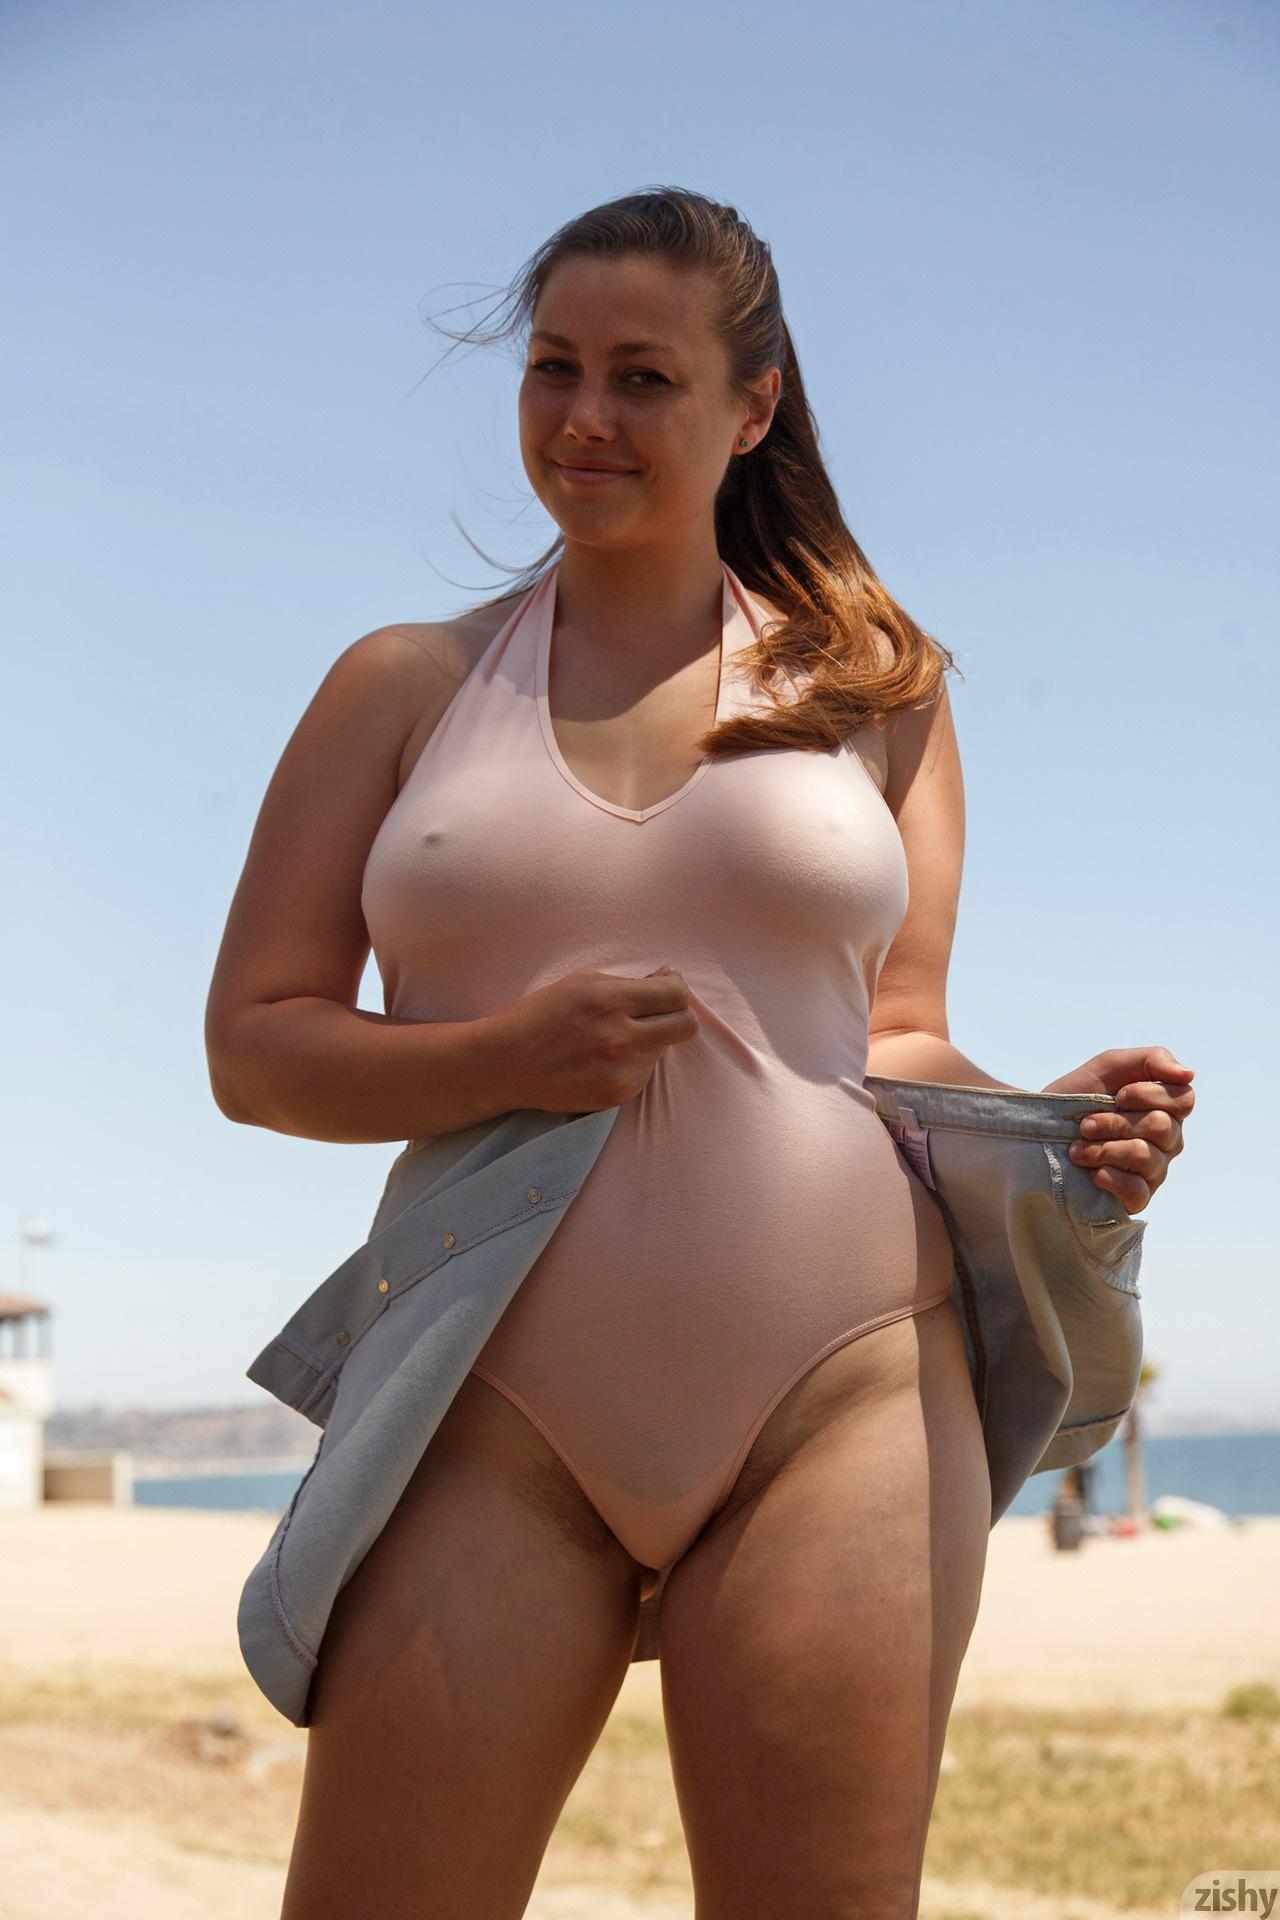 Big Perfect Round Boobs